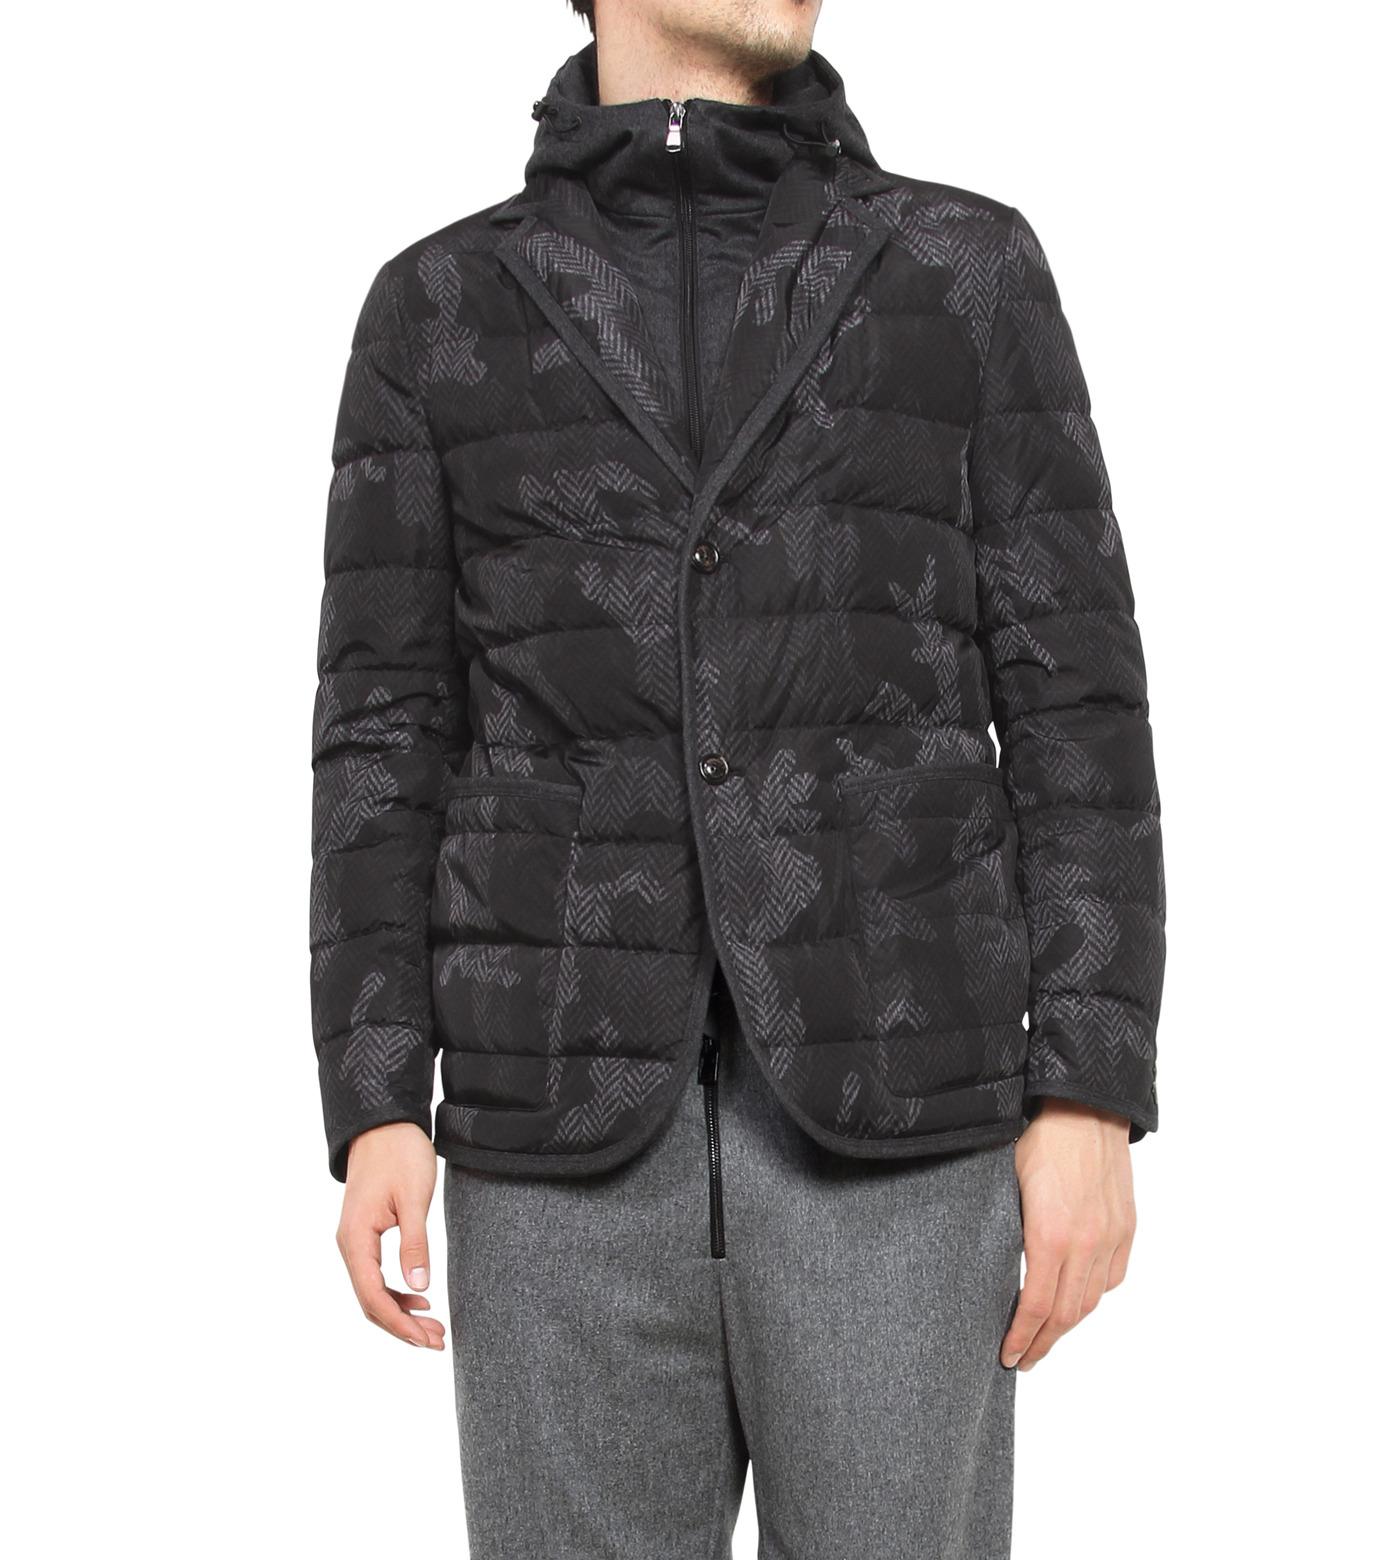 Moncler(モンクレール)のROCHER-CHARCHOL GRAY(ジャケット/jacket)-309558053710-12 拡大詳細画像1